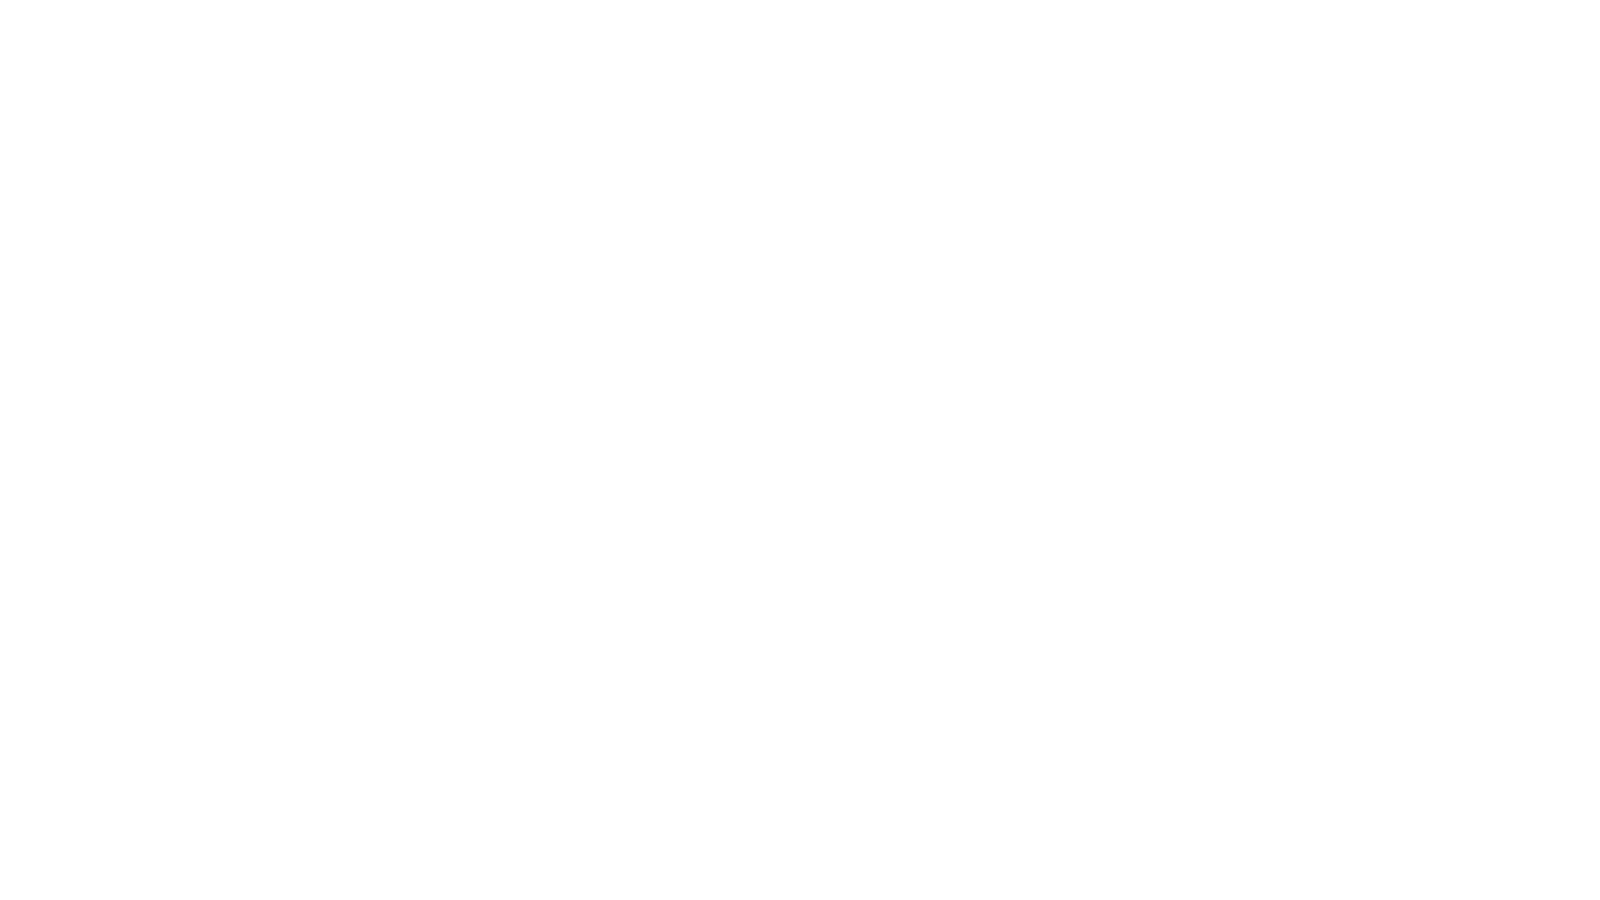 New recording project Voordekunst: Eternal Source of light Divine  https://www.voordekunst.nl/projecten/10946-eternal-source-of-light-divine  Robert Kuizenga (counter tenor) Bruno Fernandes (trumpet) Mike Fentross (theorbo) Tymen Jan Bronda (organ) Bernhardt Edskes (organ builder)  Help us realizing recording this great music & feel free to donate to this fundraising campaign  Jan Willem van Willigen (audio recording) Albert Jan de Boer (video) Luuk Dijkhuis (music producer)